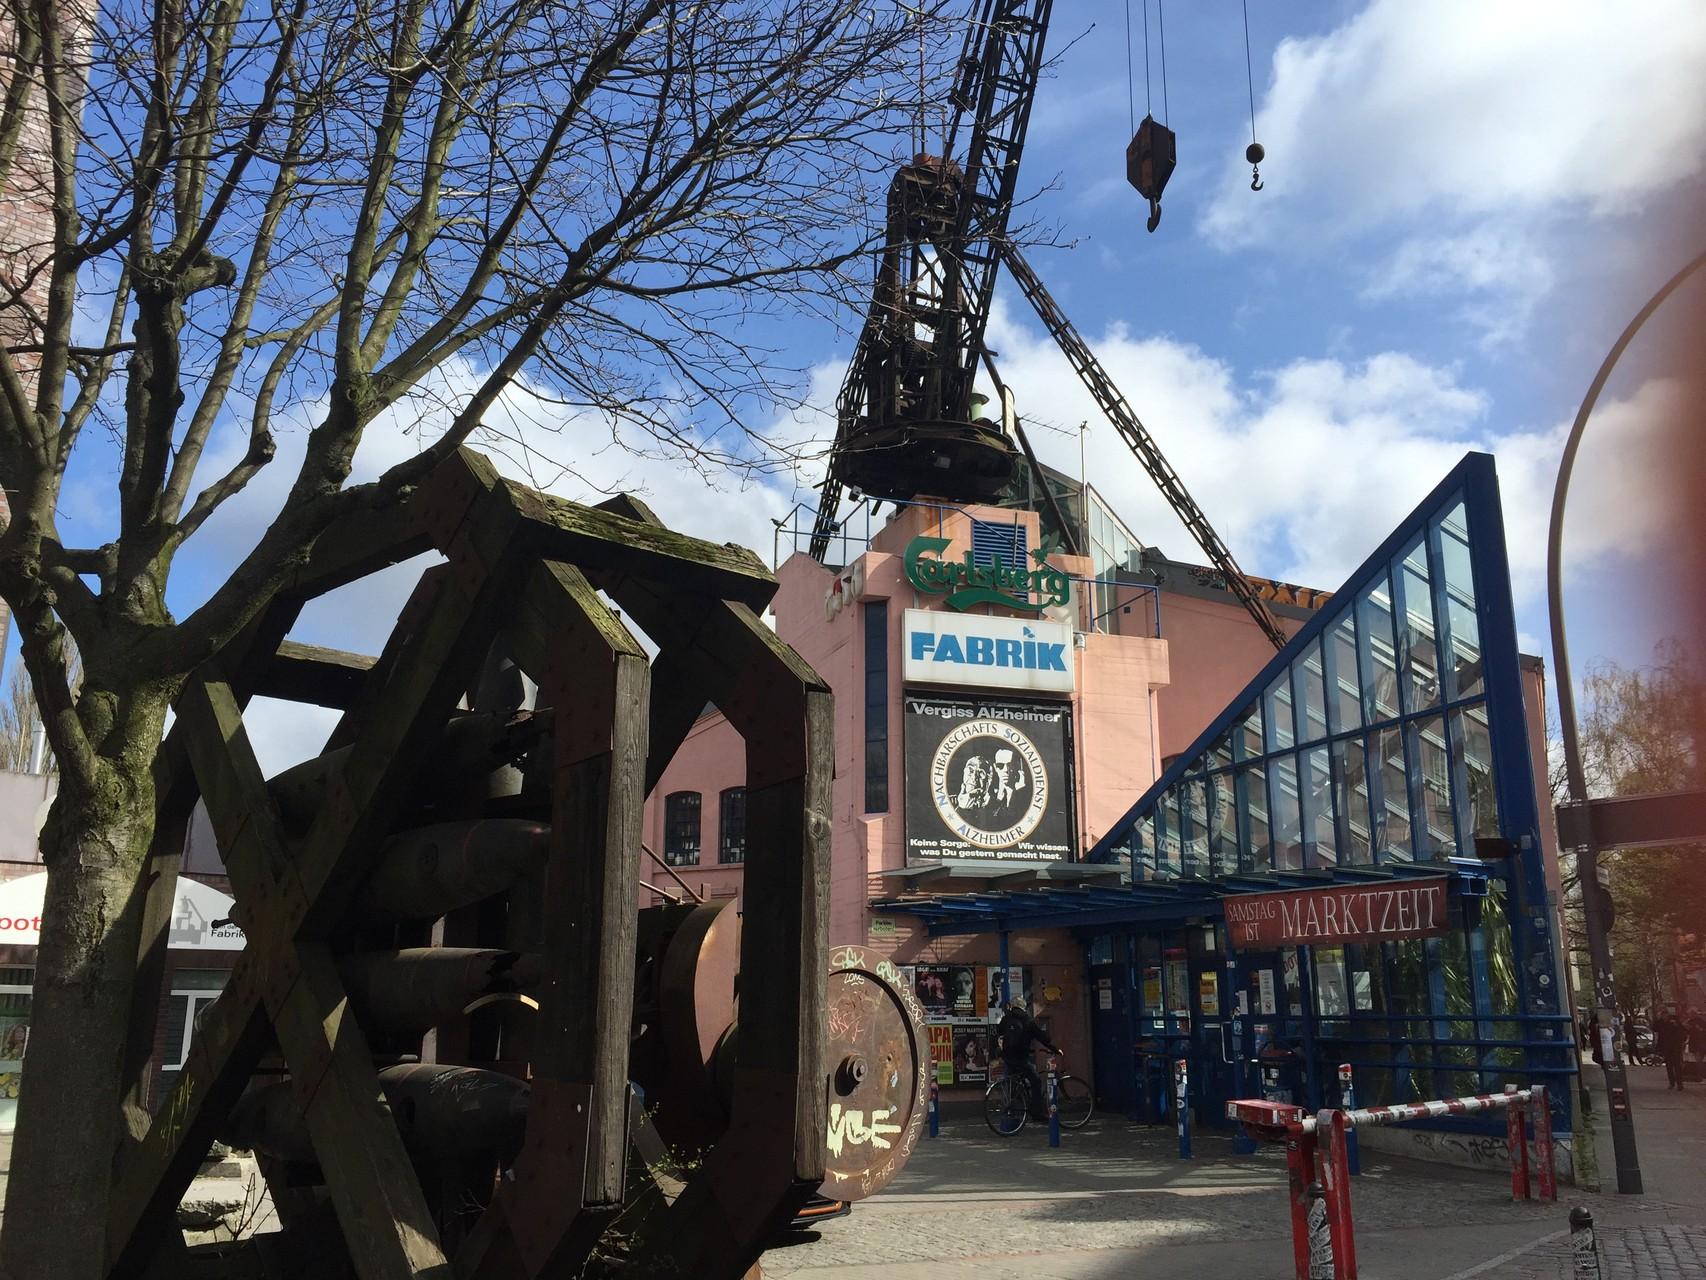 Die Fabrik in Altona  in der Barnerstraße